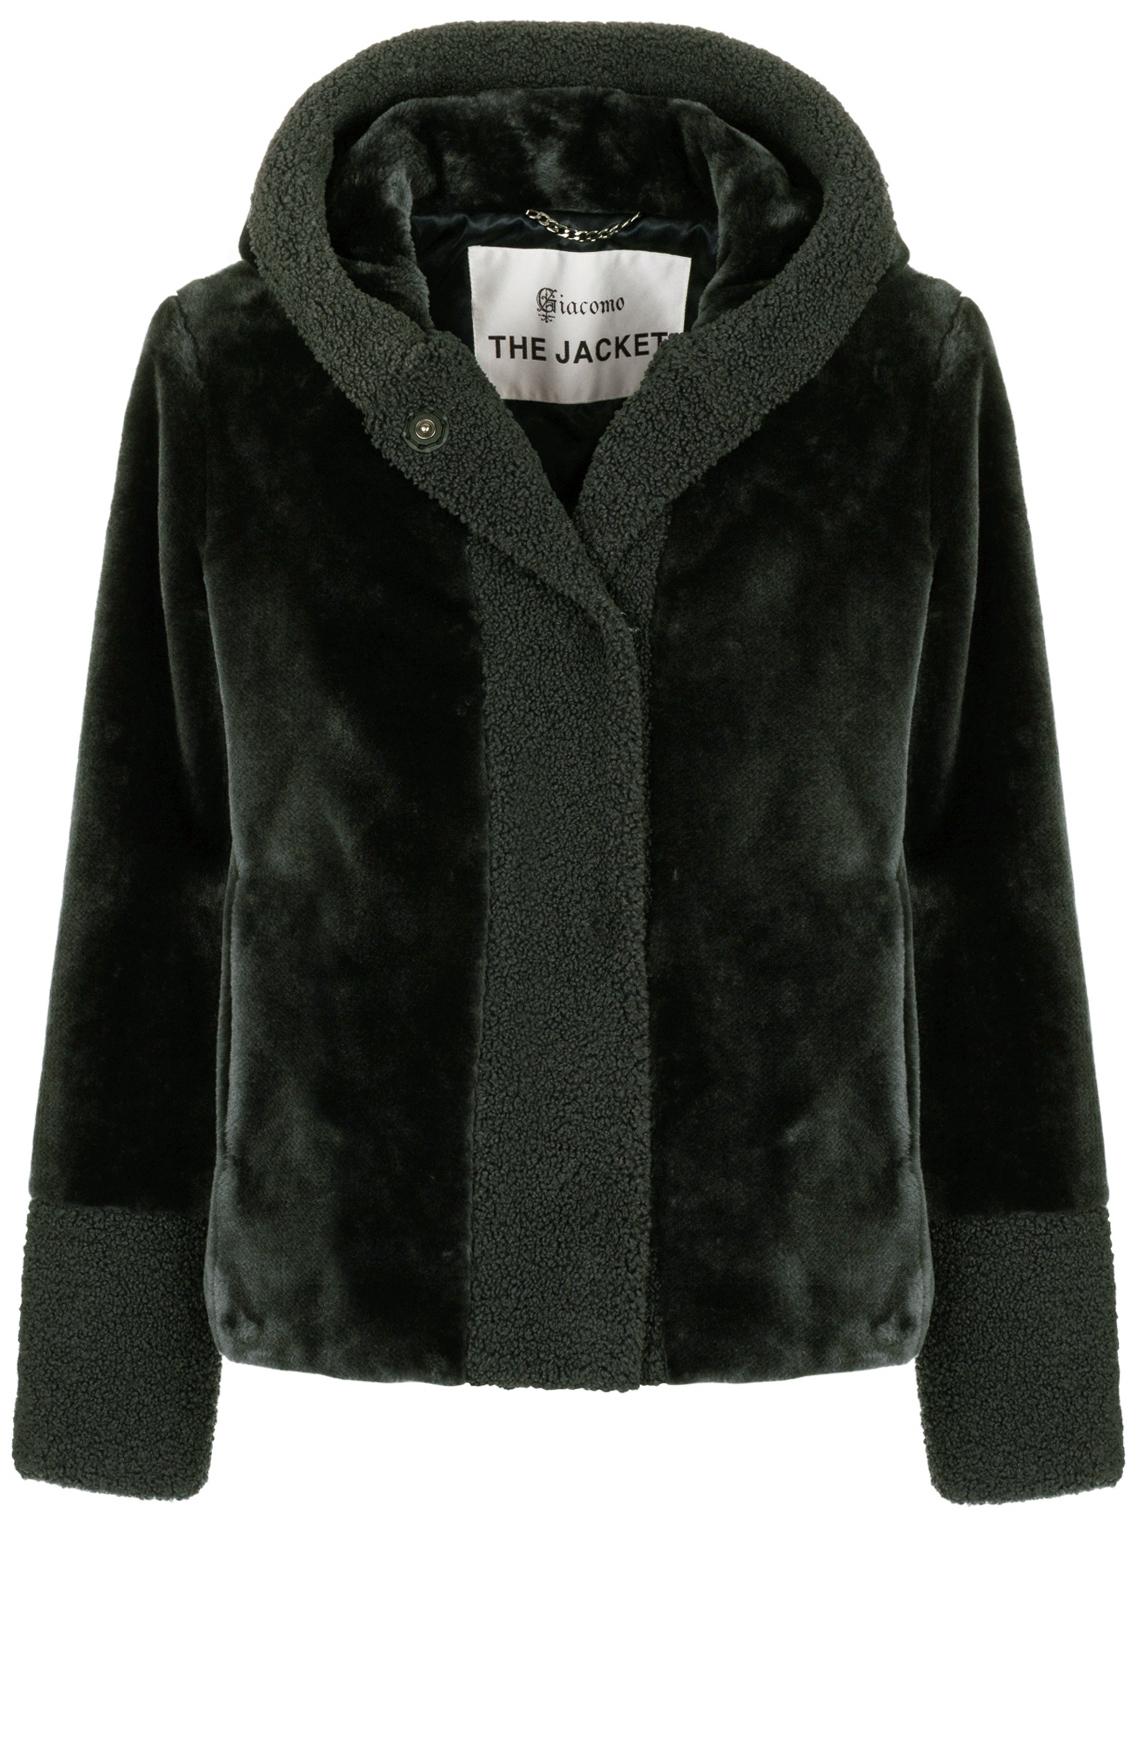 Giacomo Dames Korte fake fur jas groen